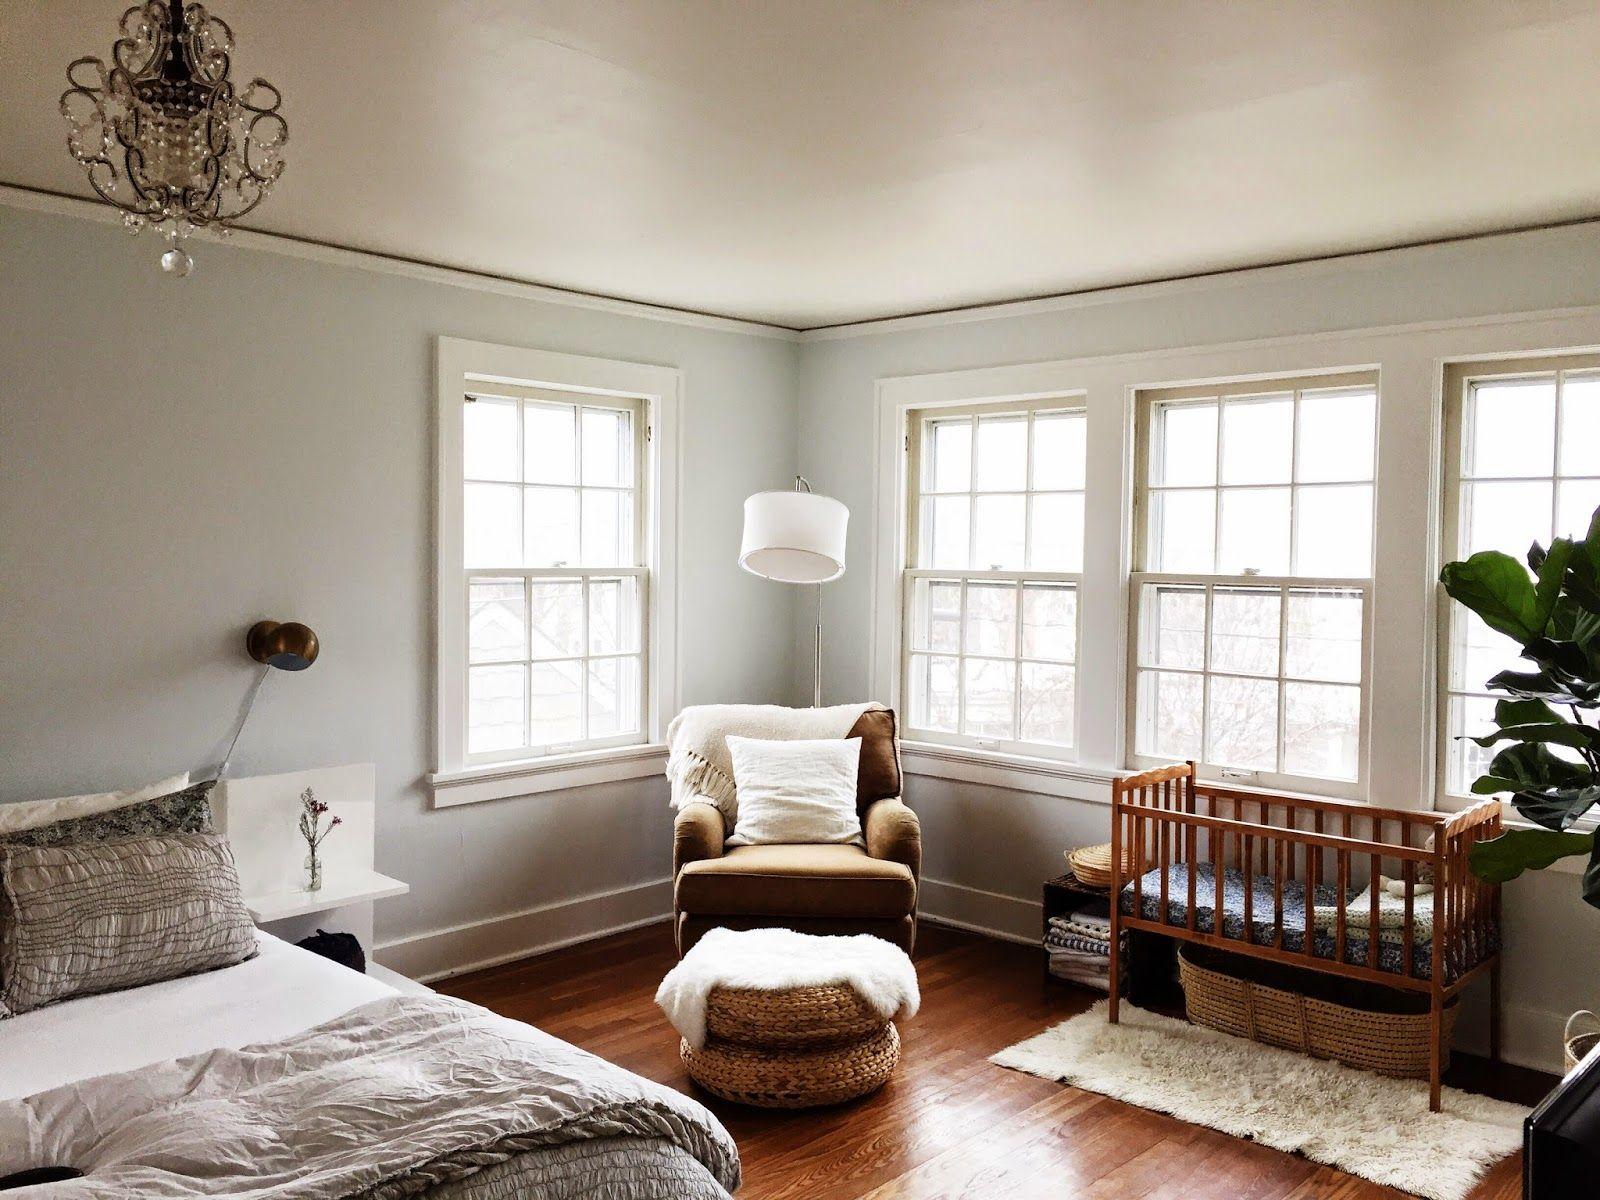 shared space nursery master bedroom h o m e nursery nook baby bedroom master bedroom. Black Bedroom Furniture Sets. Home Design Ideas